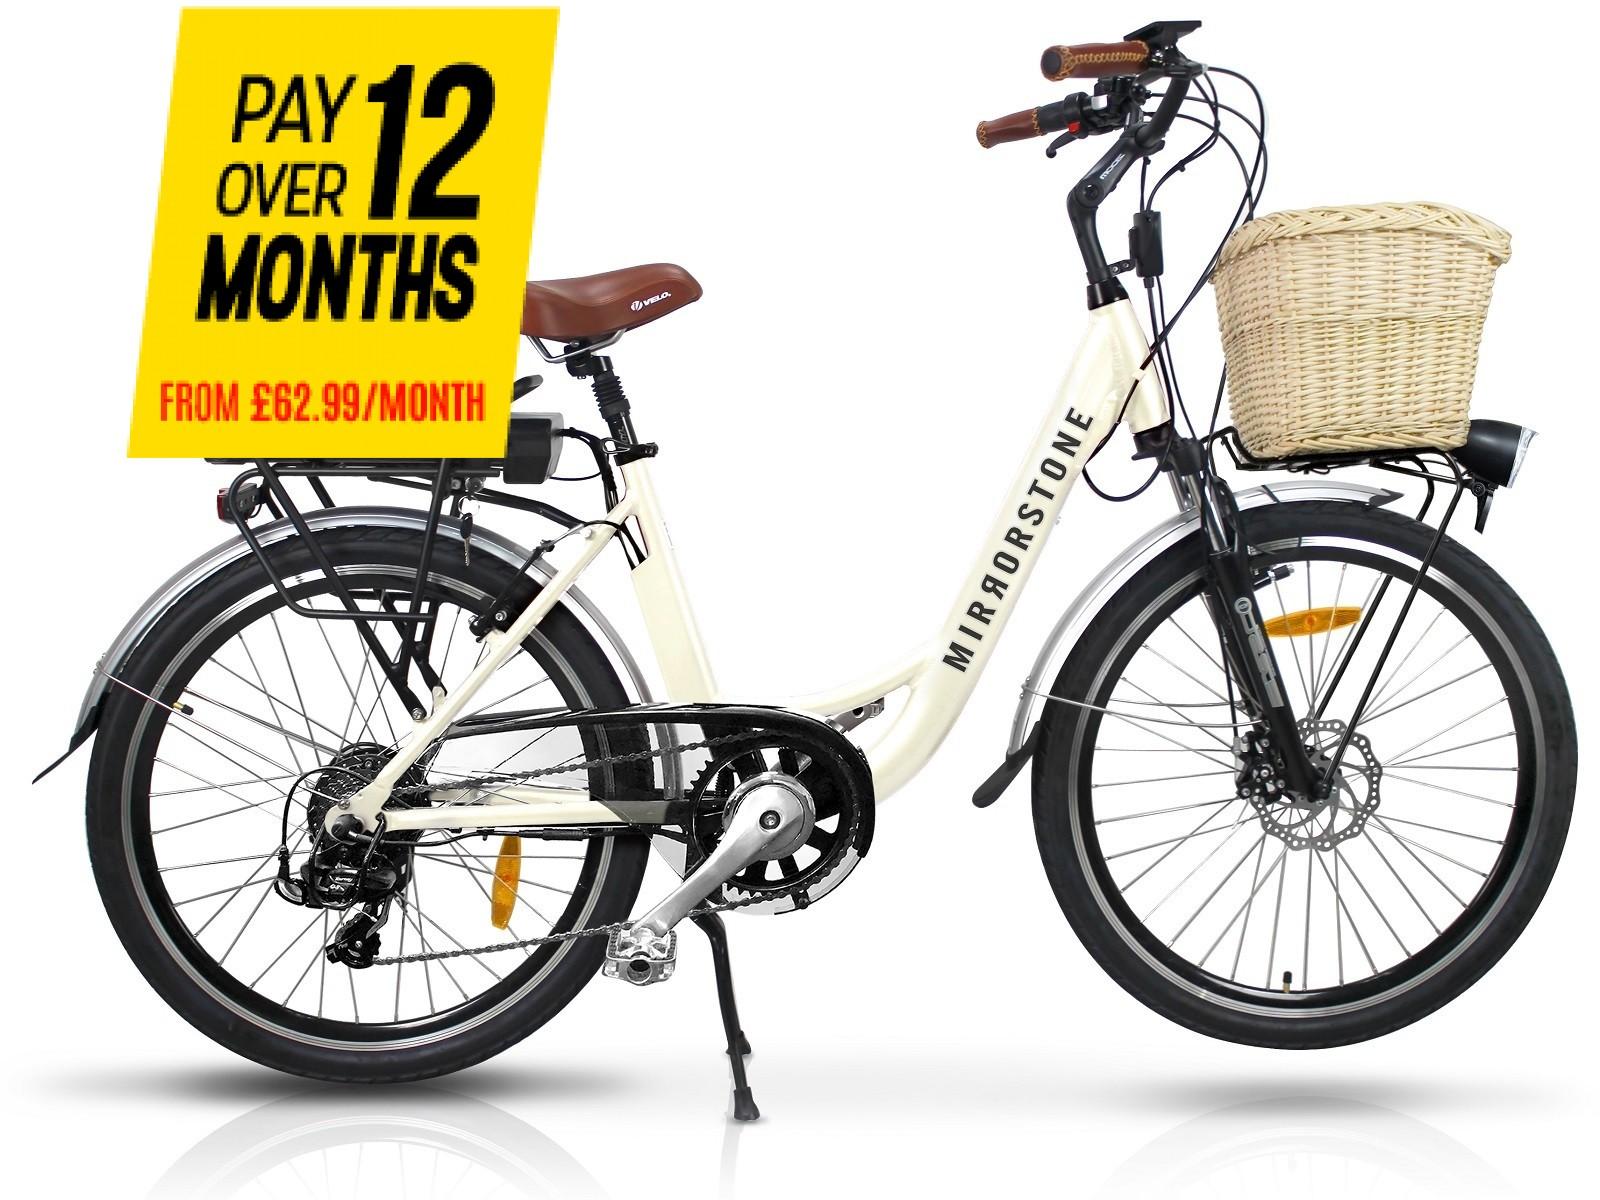 Sprint Electric Bike Milky White Wheels - Last bike Remaining - Buy Now!